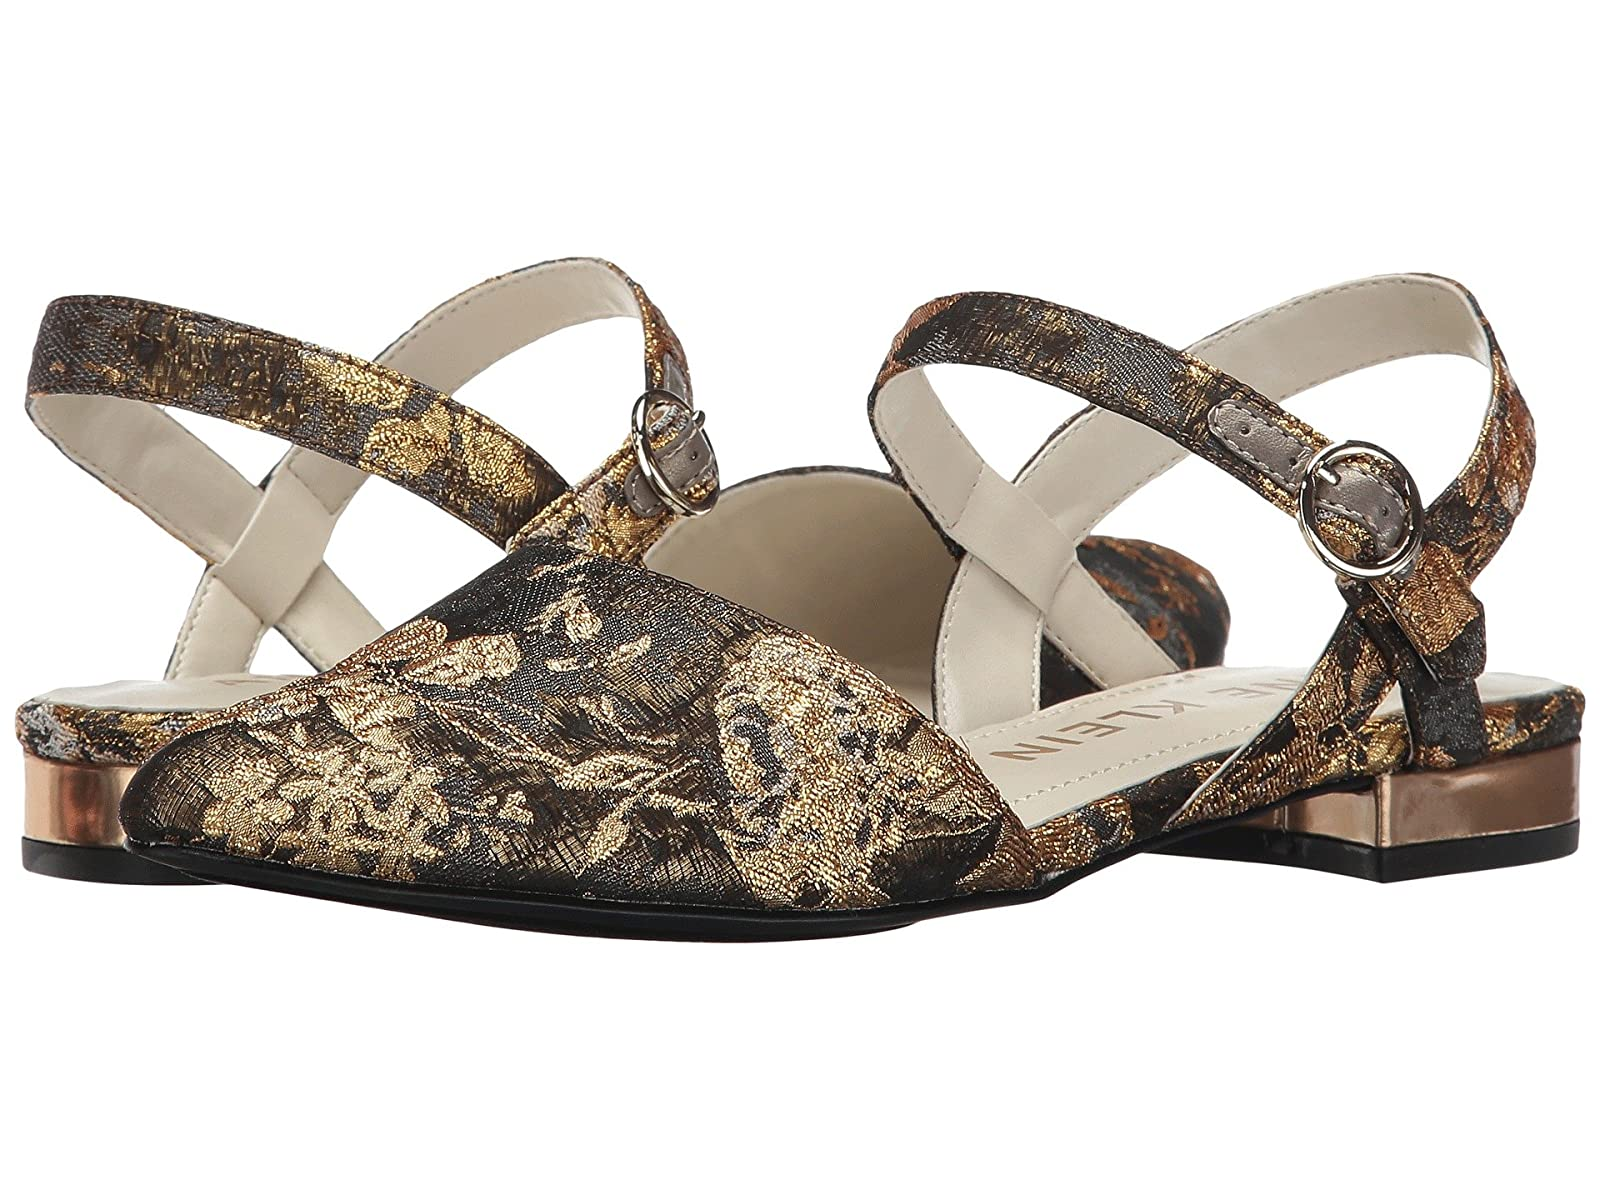 Anne Klein OdellCheap and distinctive eye-catching shoes